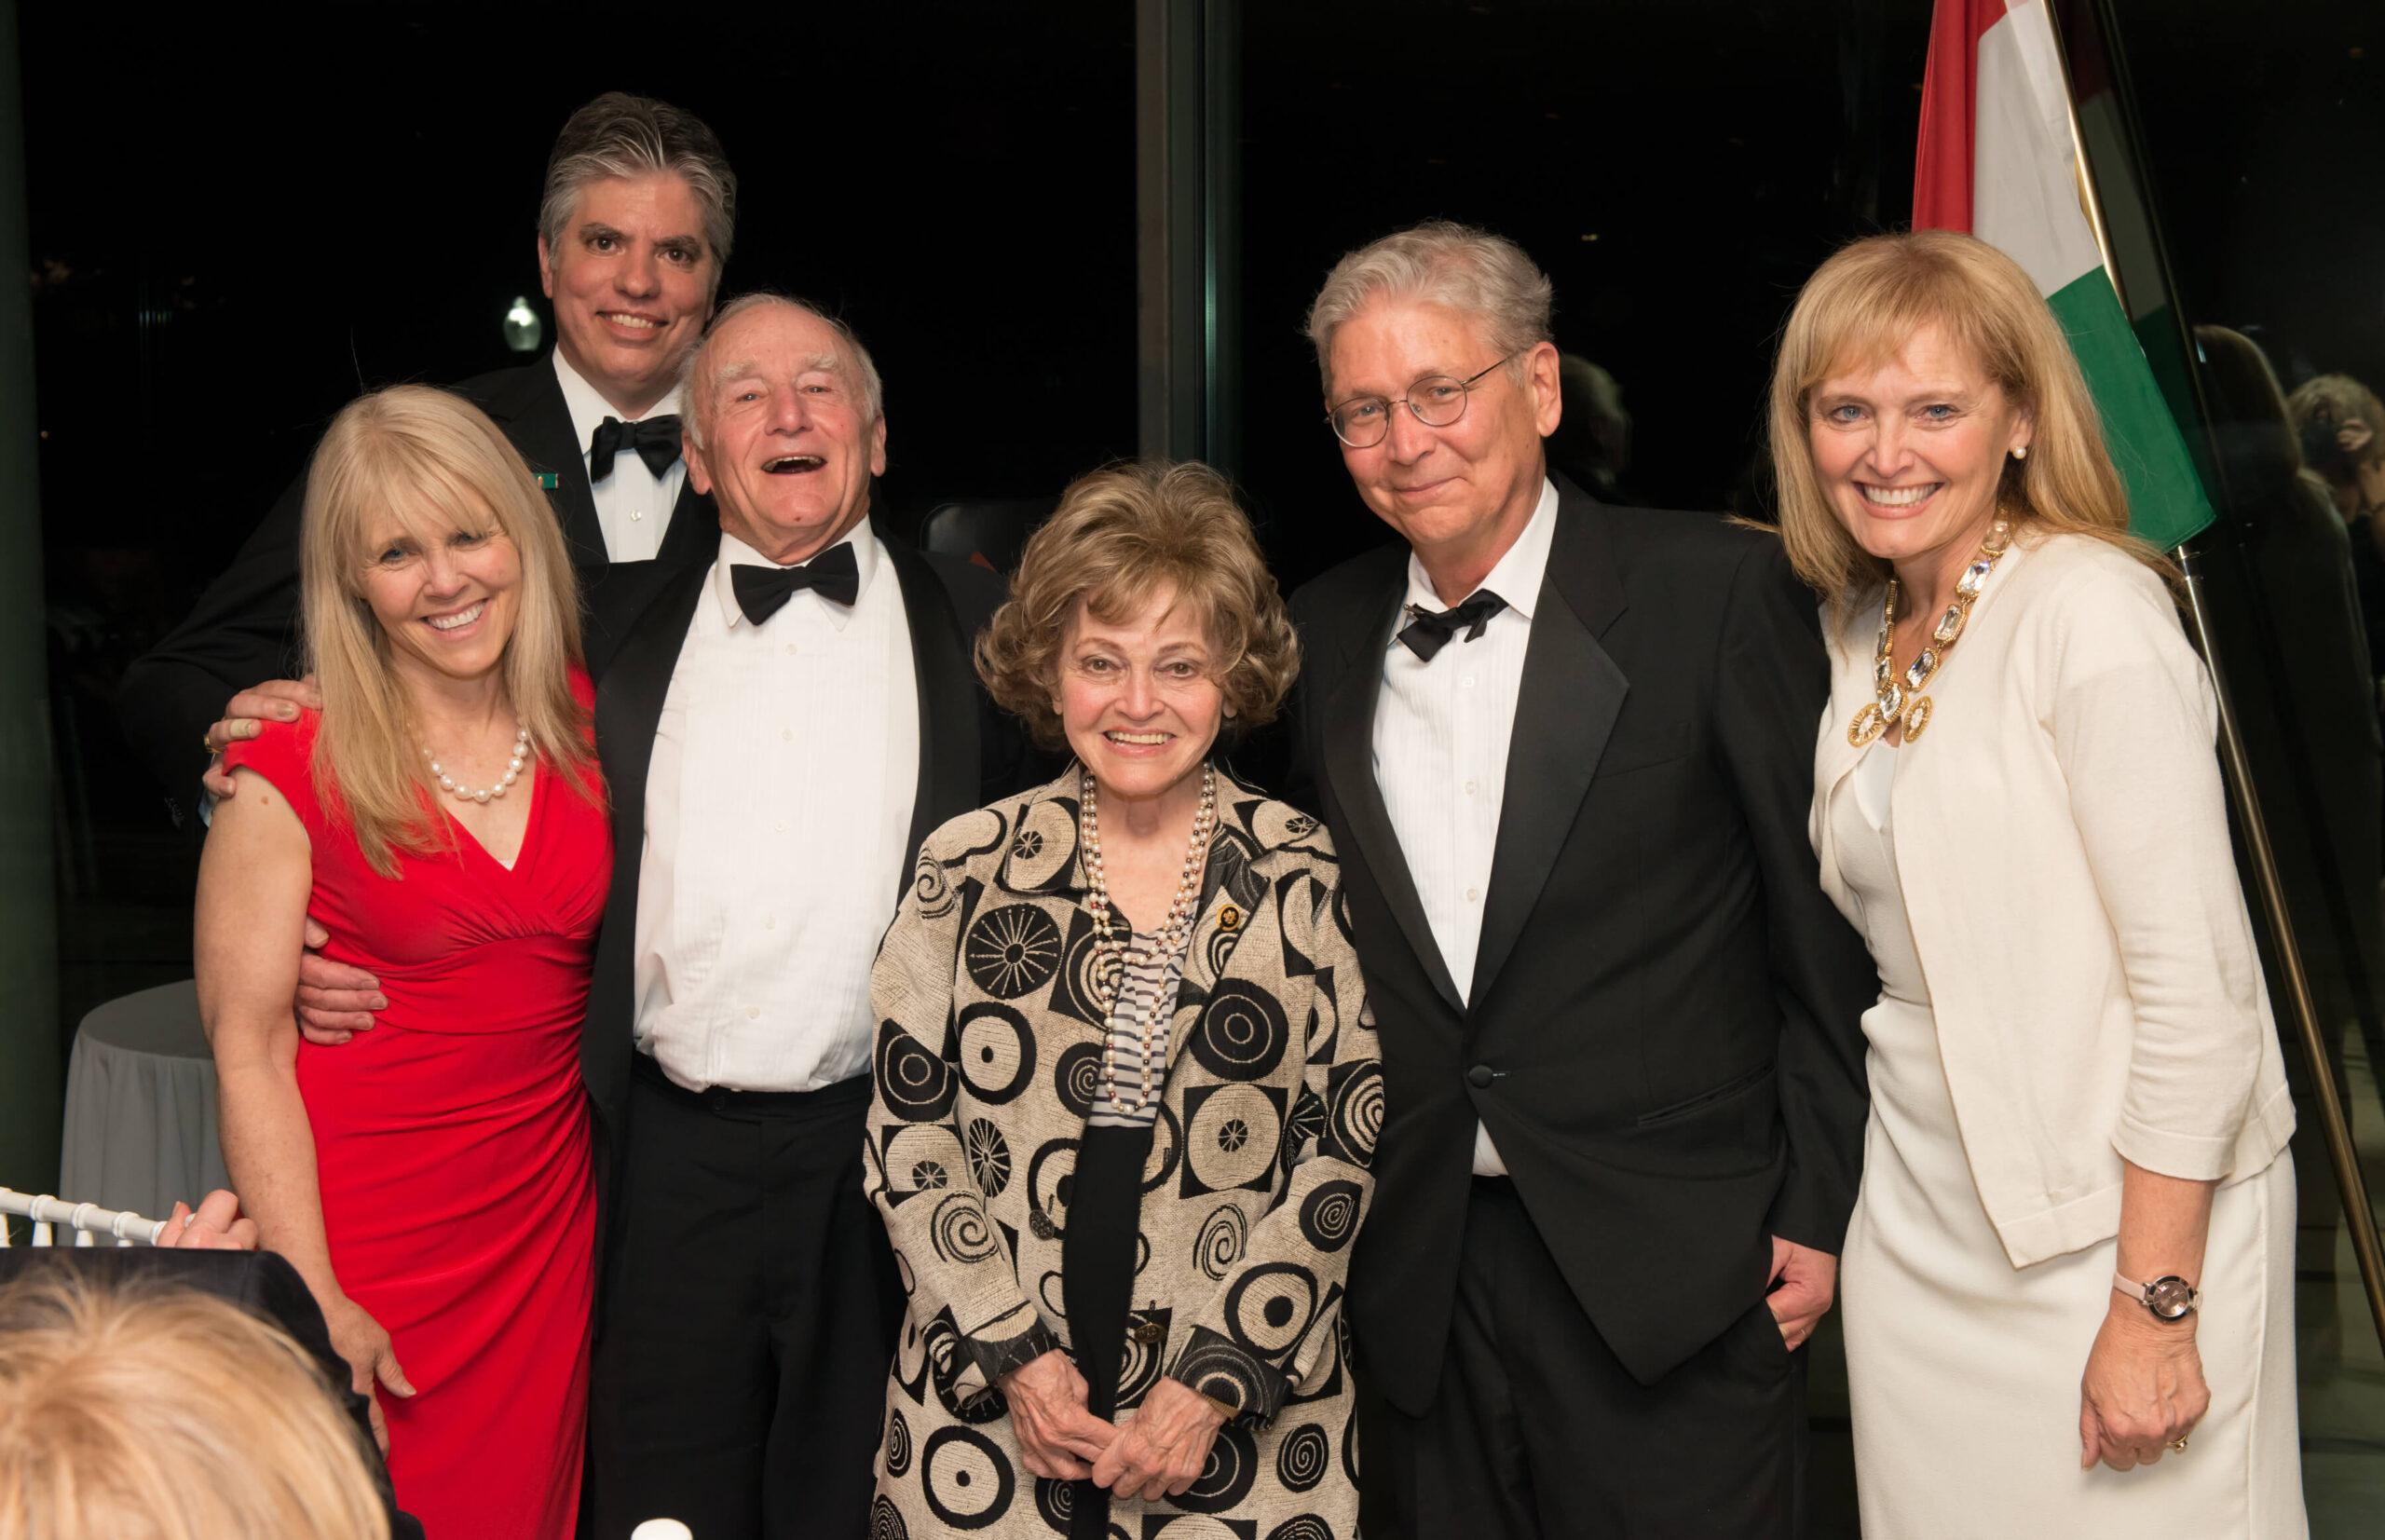 Mrs. Annette Tillemann-Dick, Mr. Max Teleki, Ambassador George h. Walker III, Mrs. Anette Lantos, Mr. László Hámos, Mrs. Katrina Lantos Swett